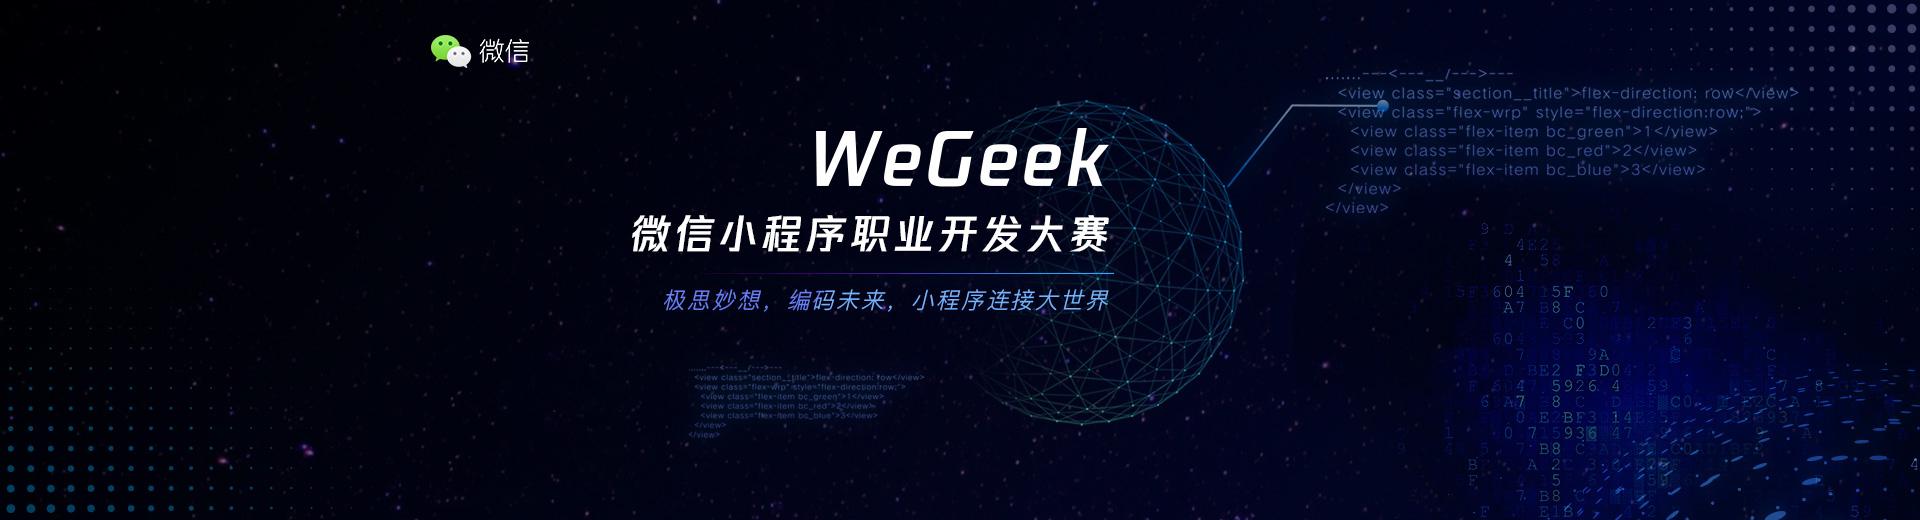 WeGeek微信小程序职业开发大赛决赛